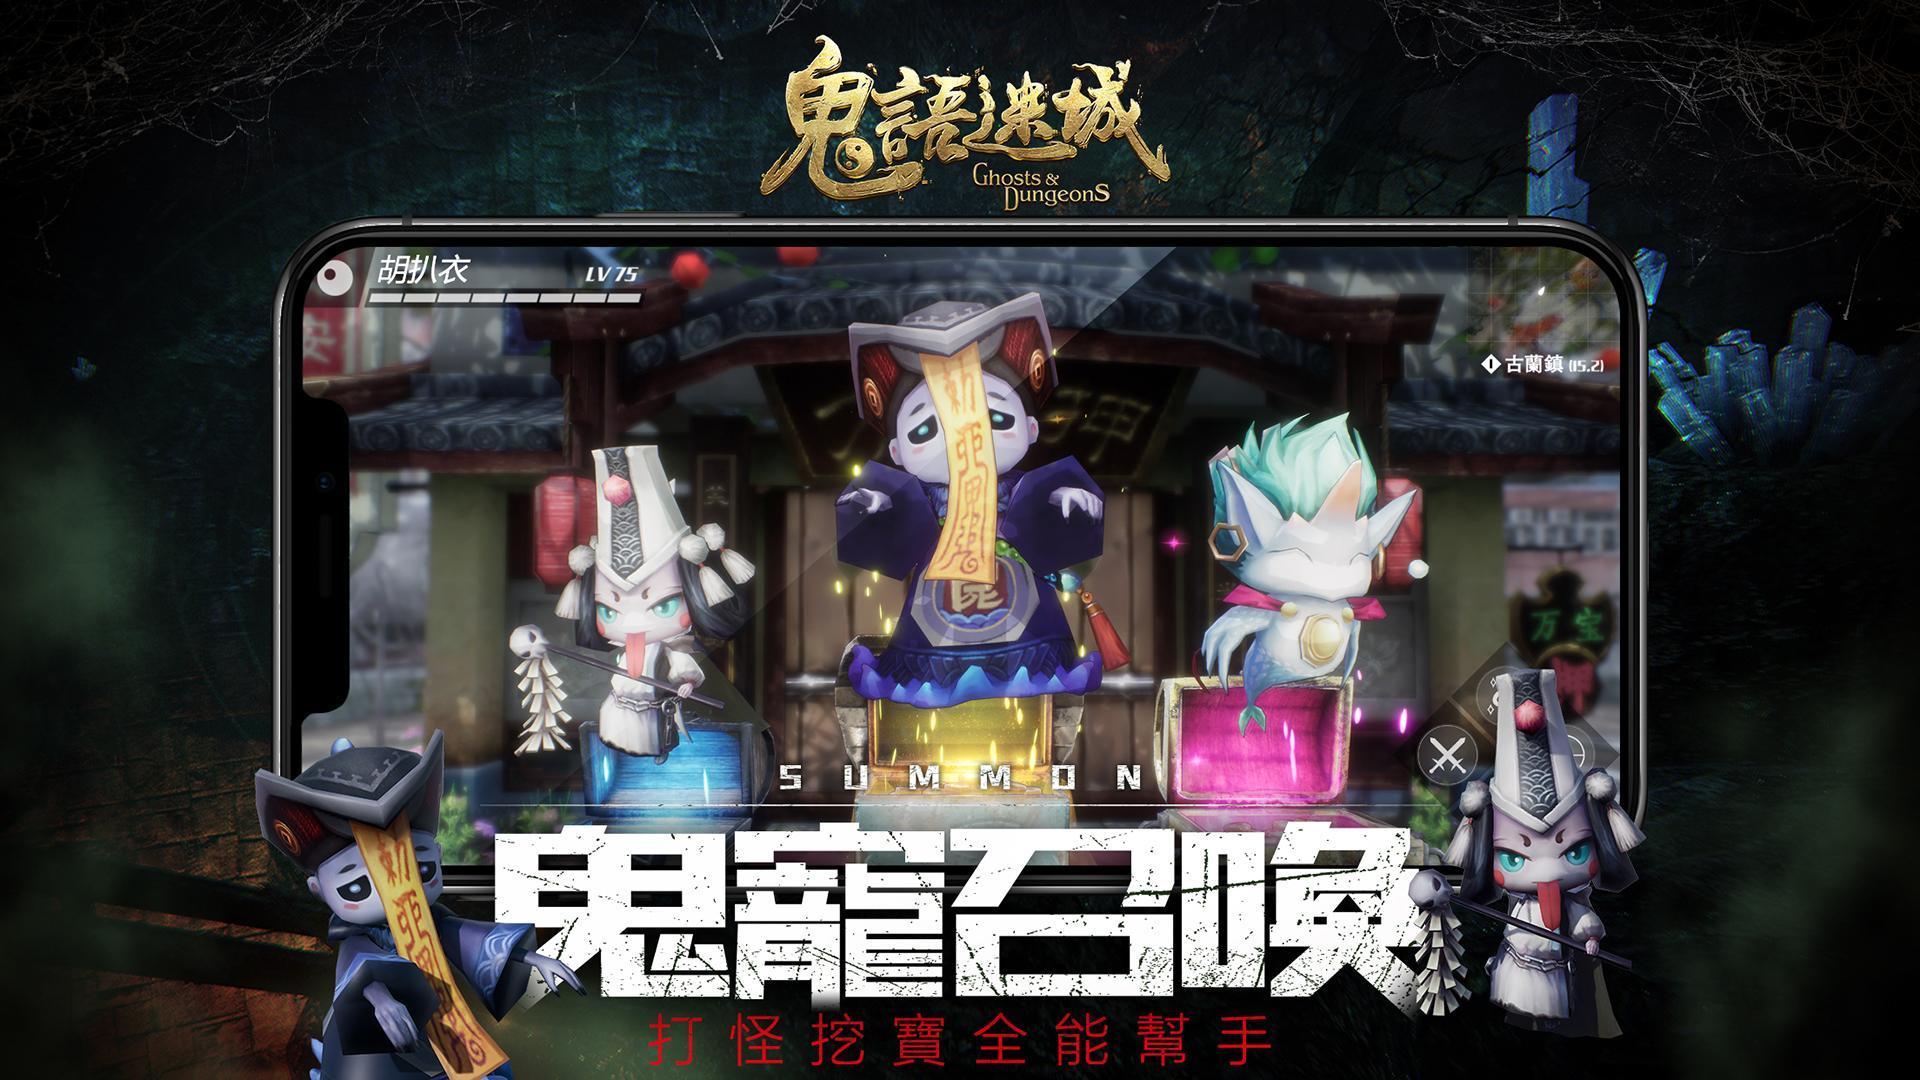 鬼語迷城 0.17.19.99.0 Screenshot 14